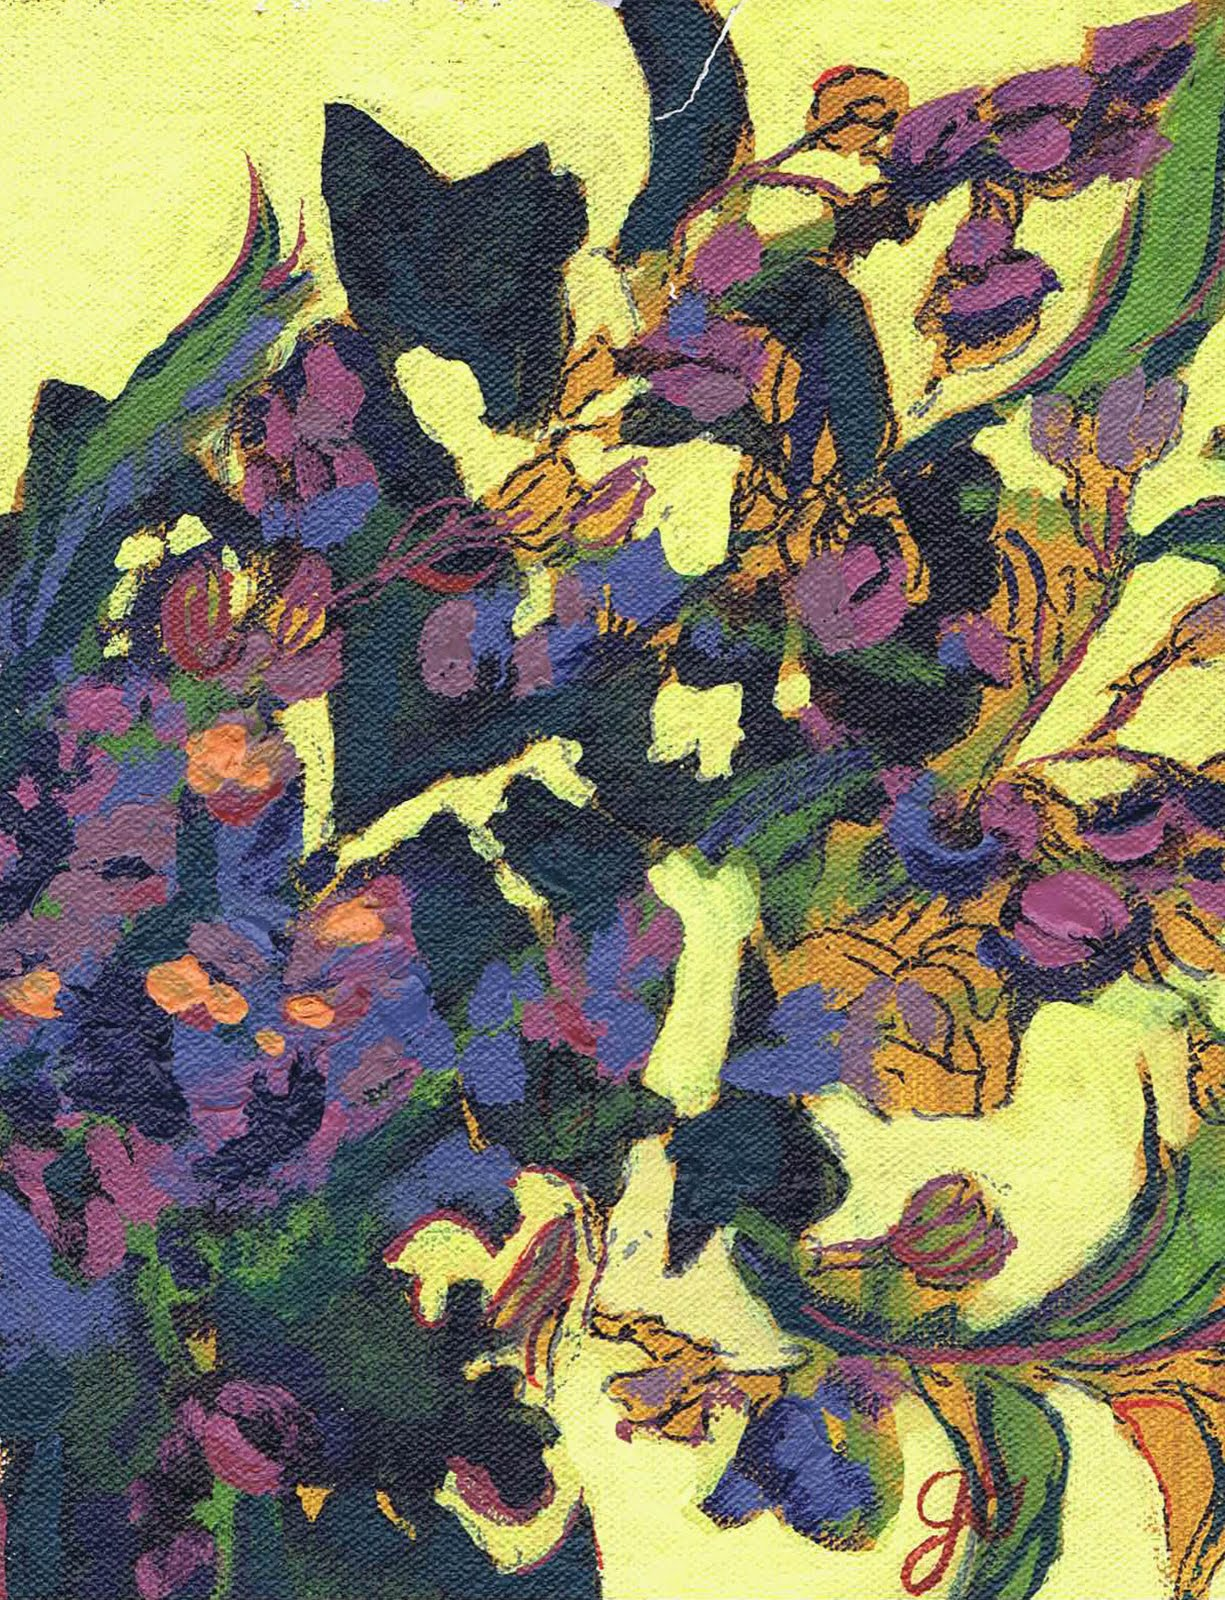 [yellow+and+purple]